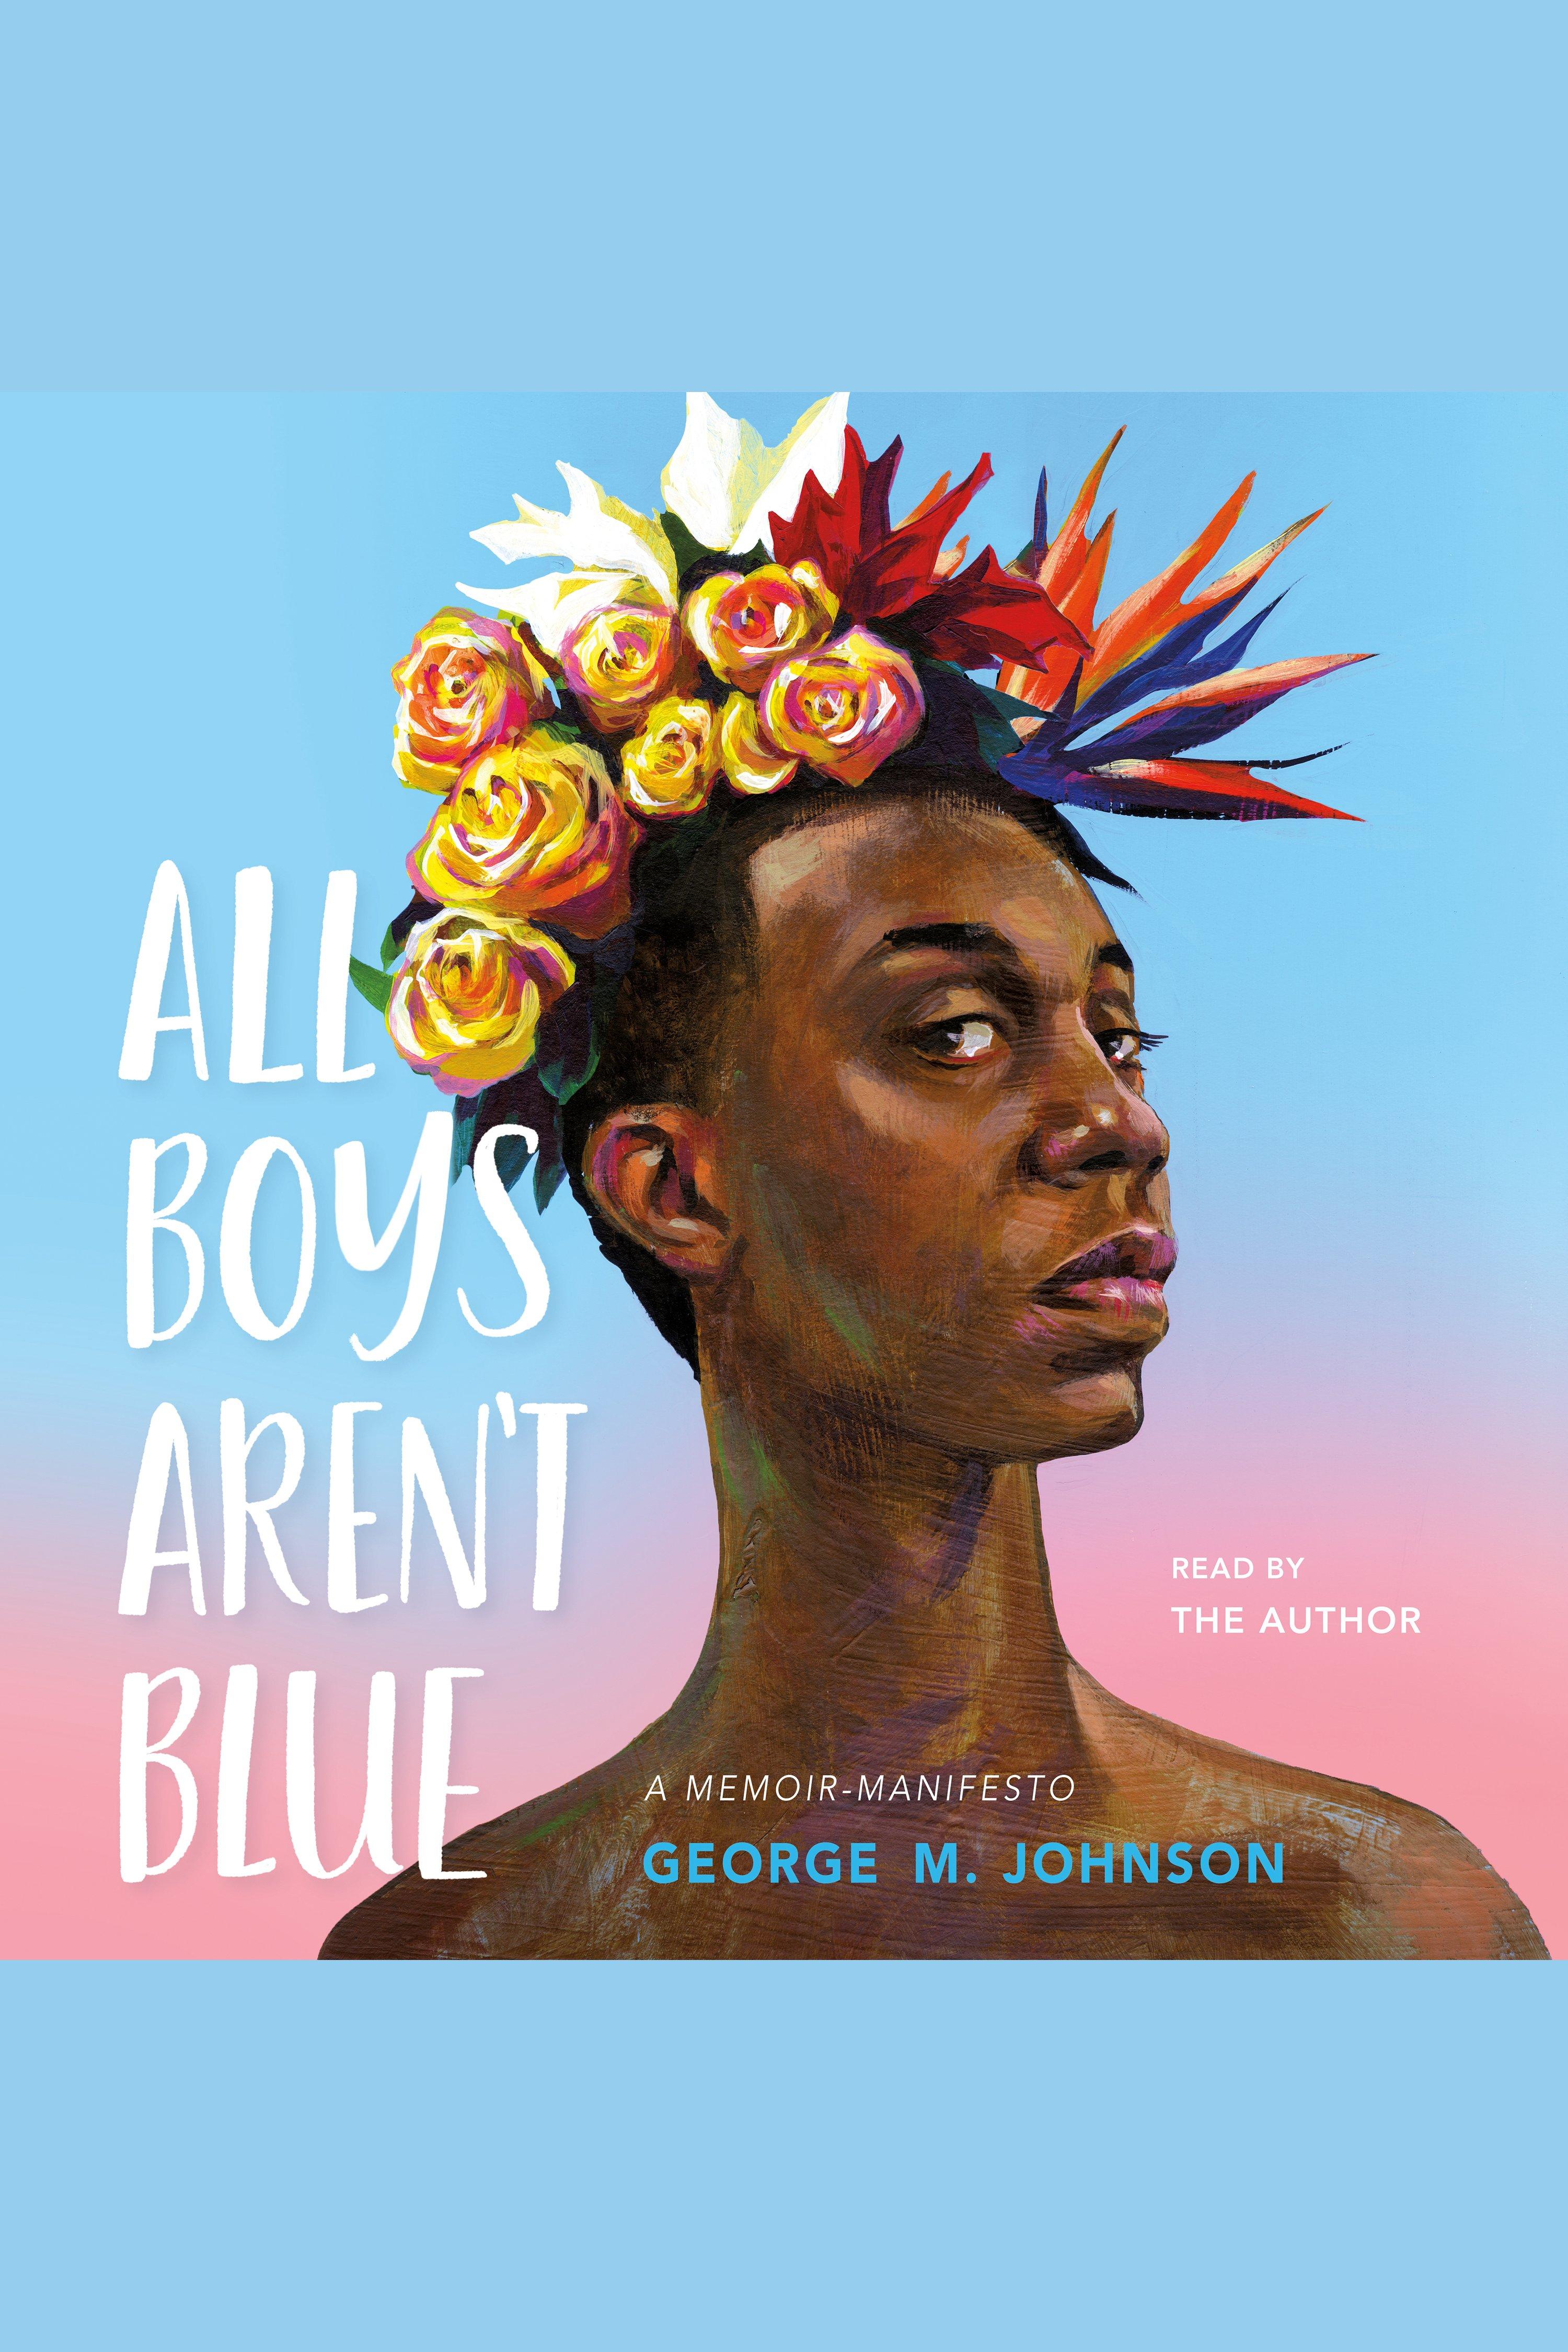 All Boys Aren't Blue A Memoir-Manifesto